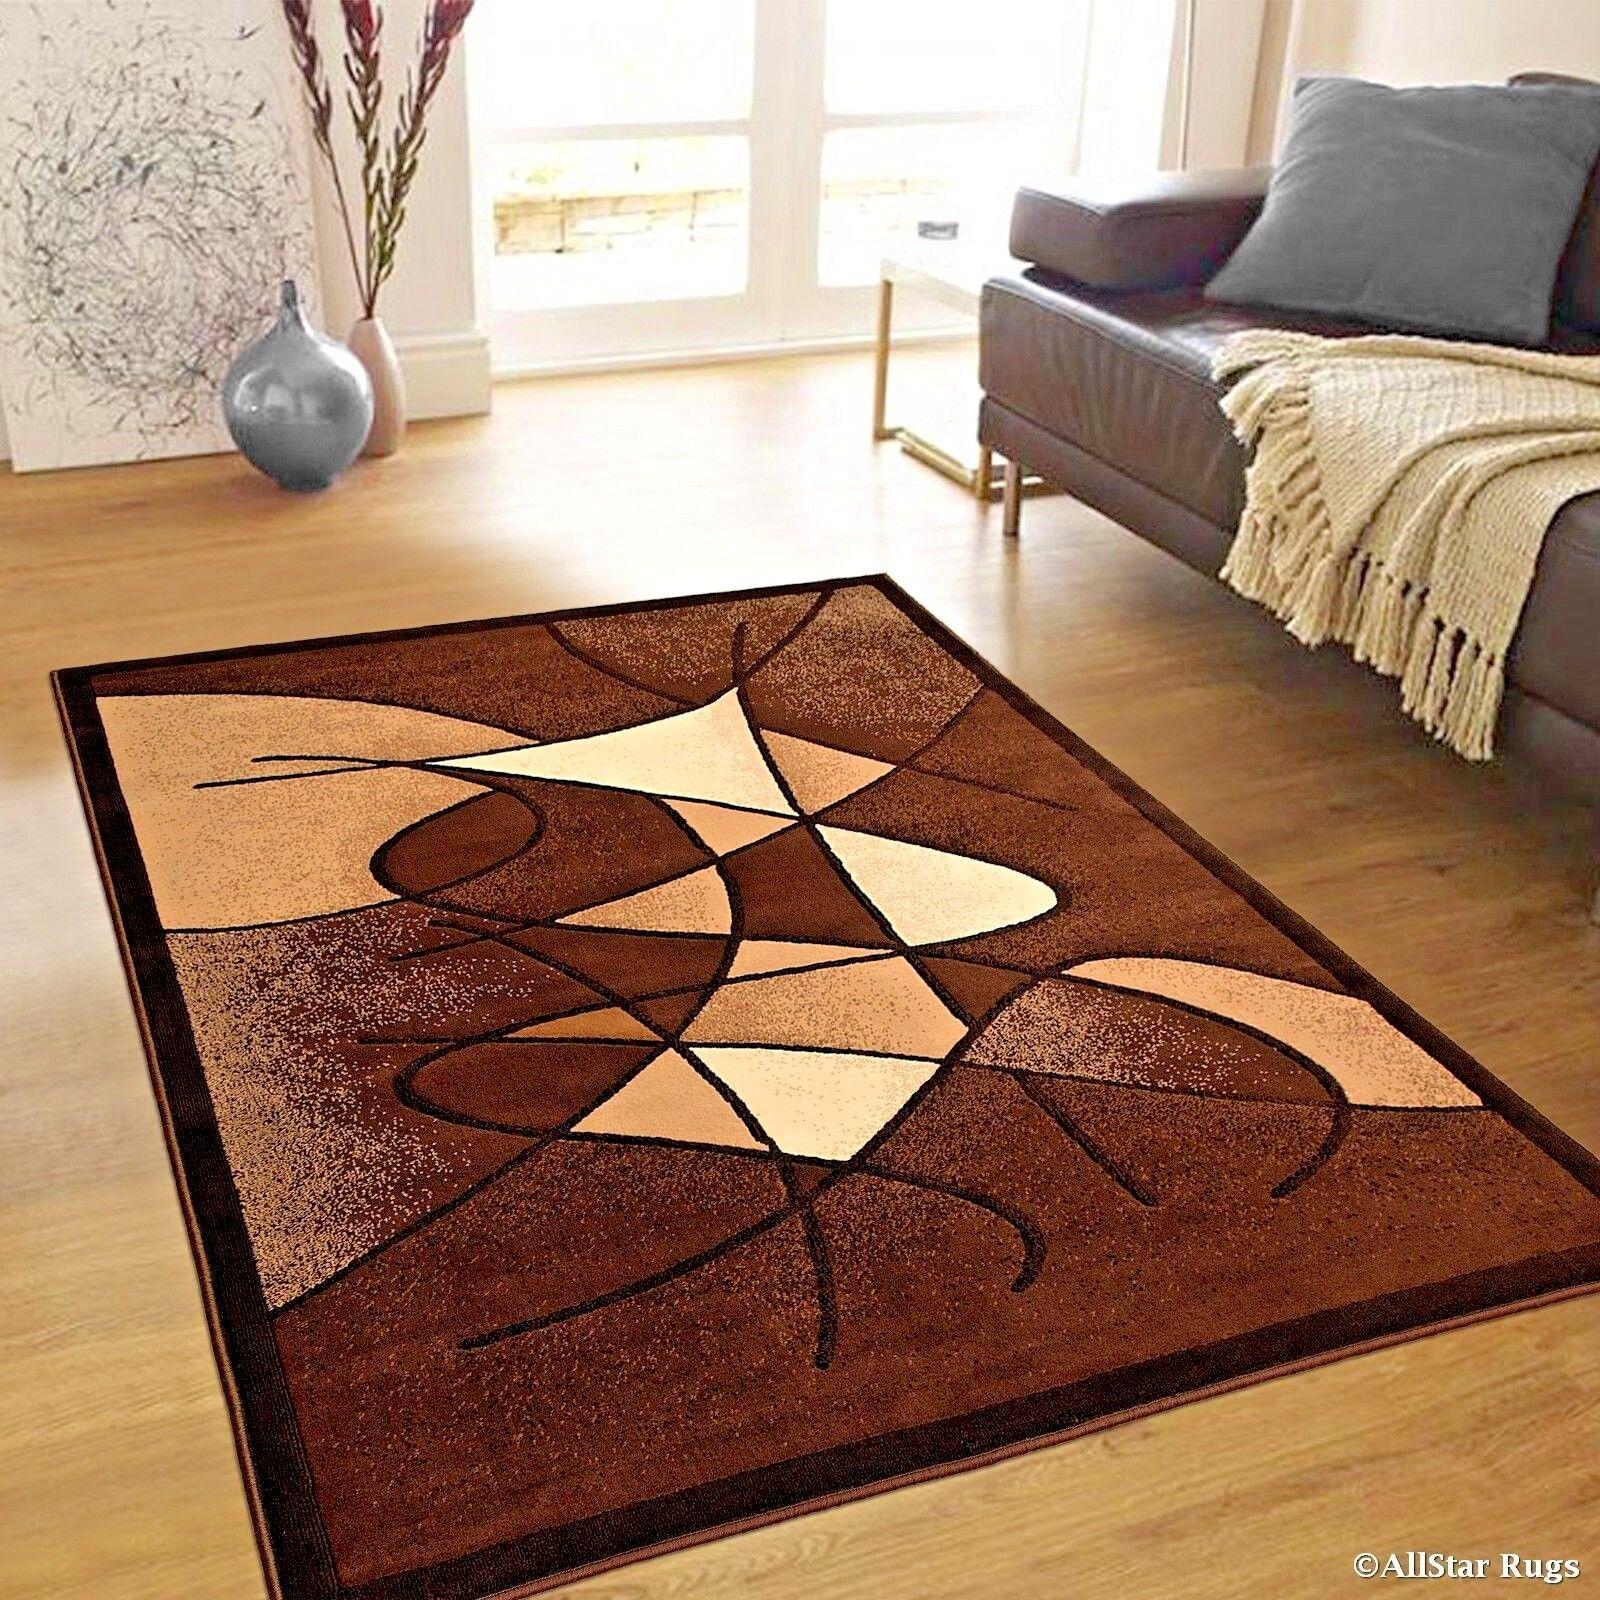 How Big Is 8x10 Rug.Details About Rugs Area Rugs Carpets 8x10 Rug Modern Large Floor Room Big Cool Brown Cute Rugs